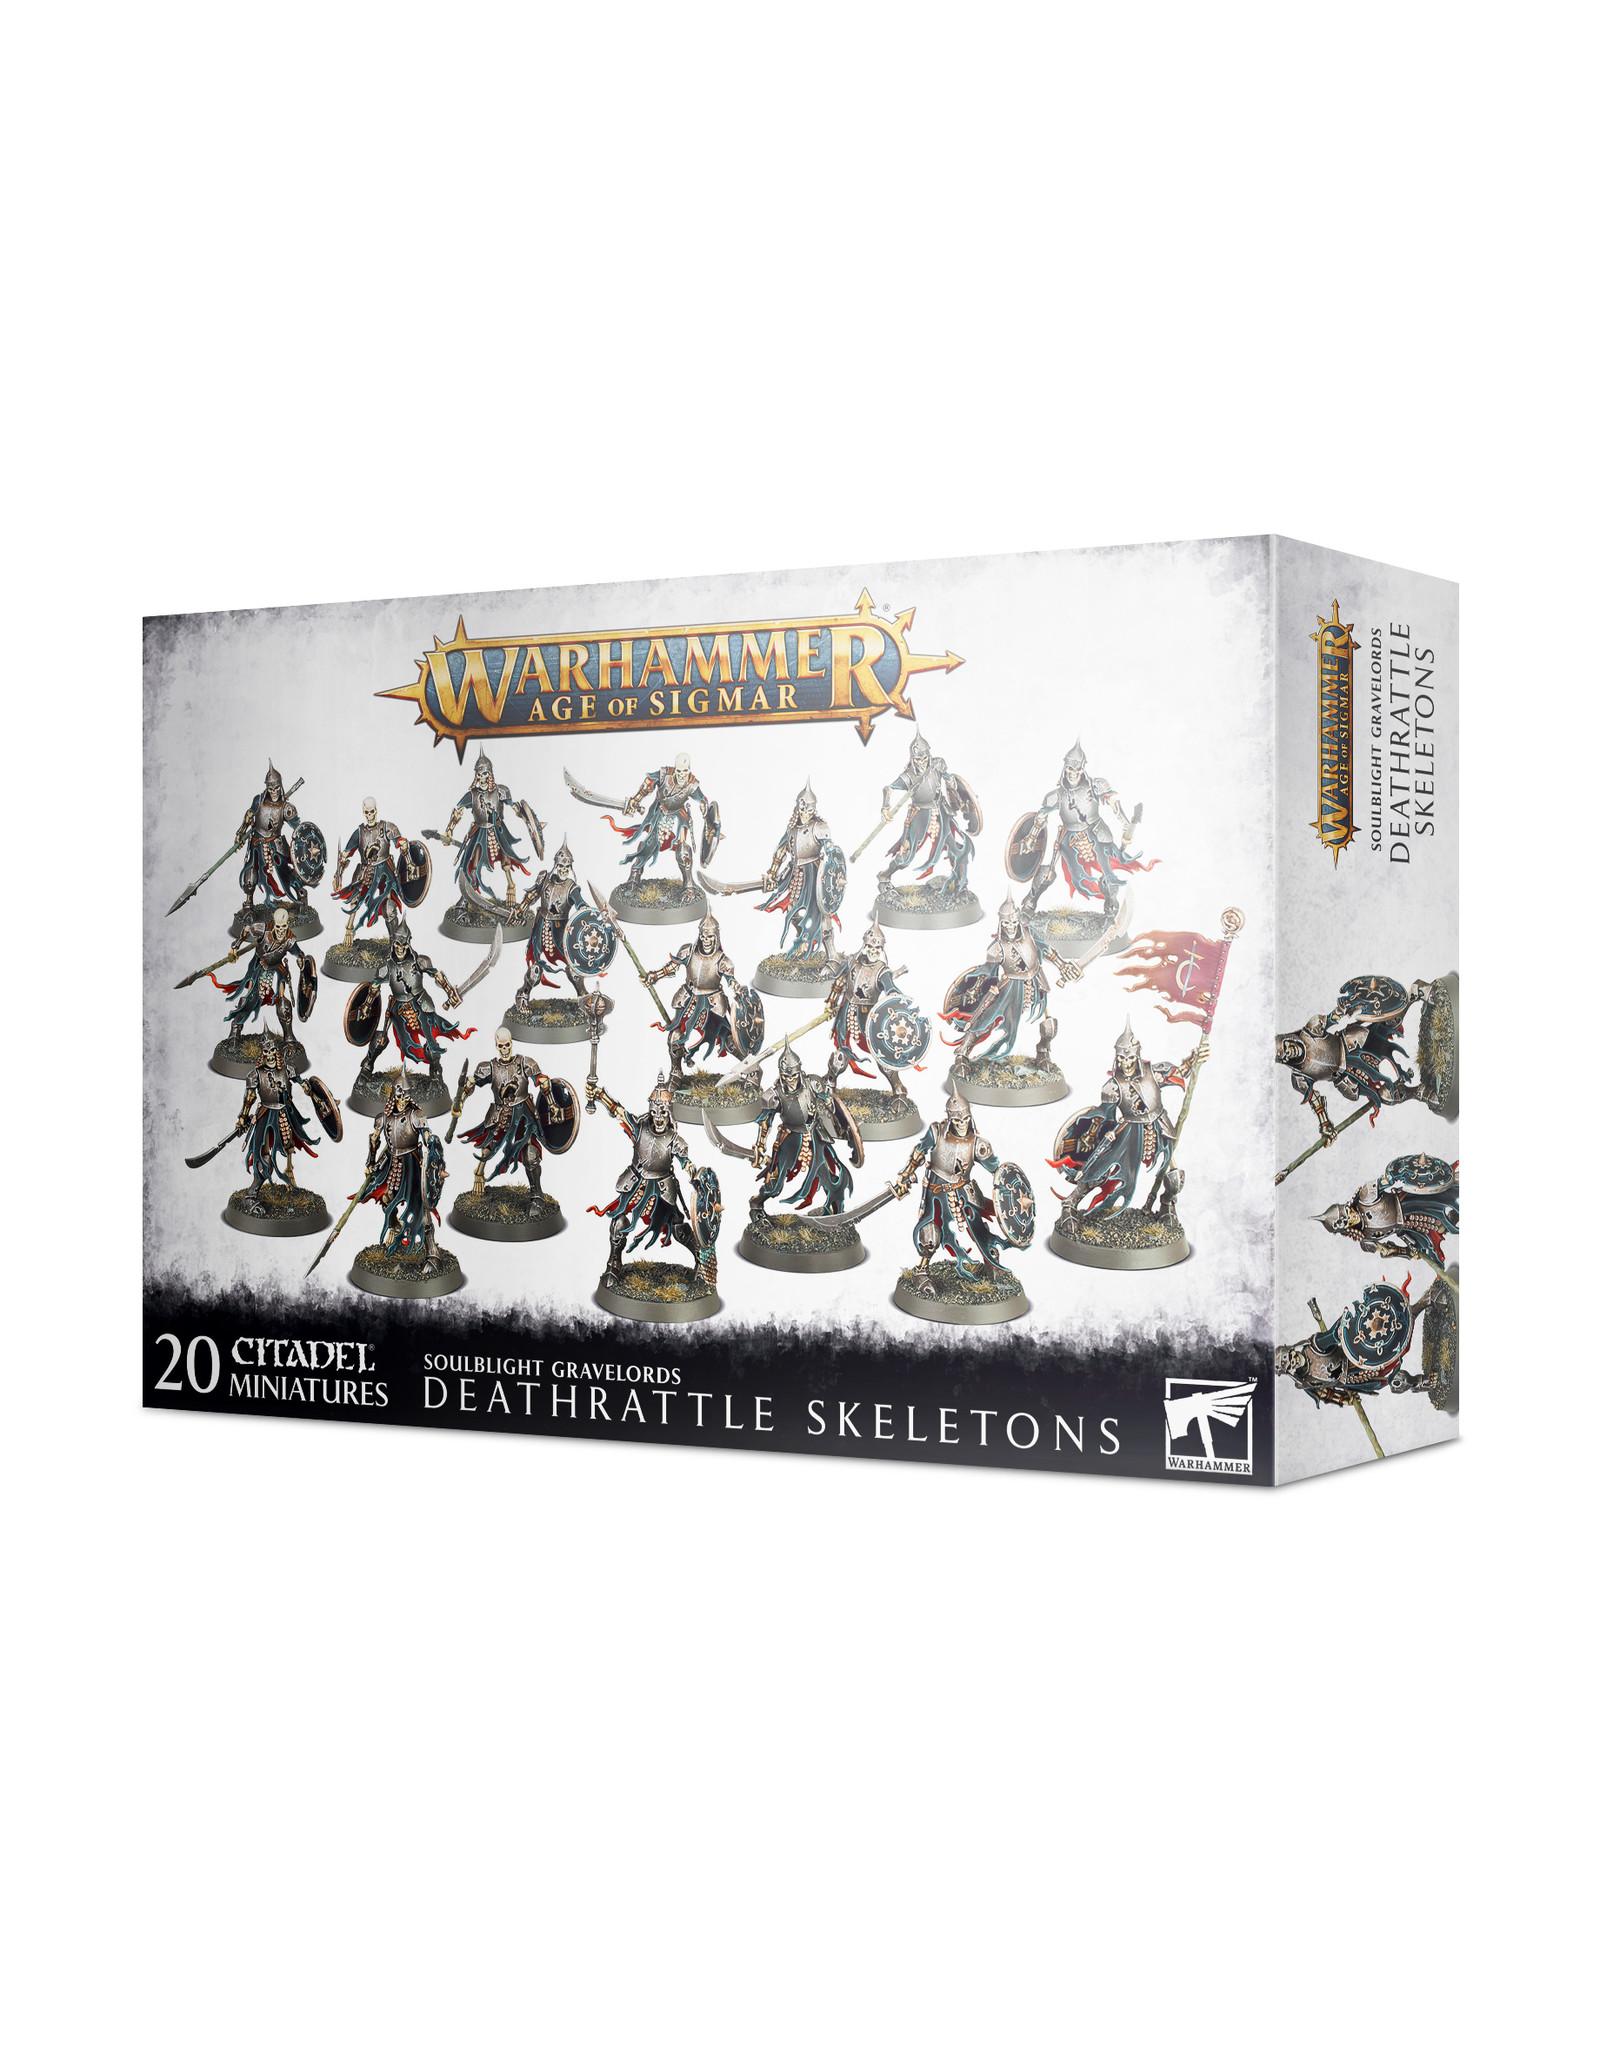 Age of Sigmar Soulblight Gravelords: Deathrattle Skeletons